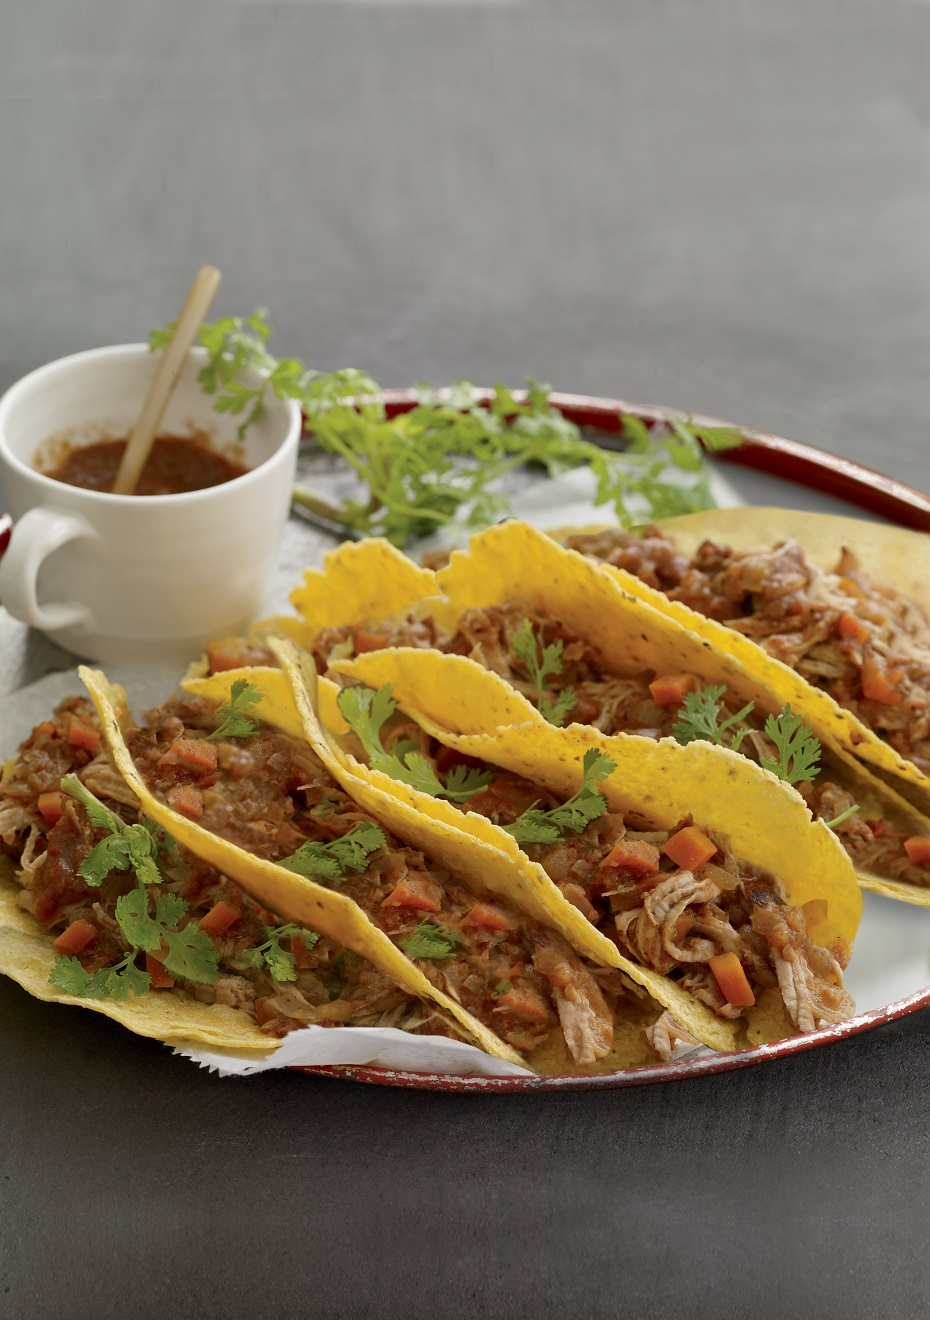 ... tacos de carnitas crispy pulled pork tacos braised pulled pork tacos